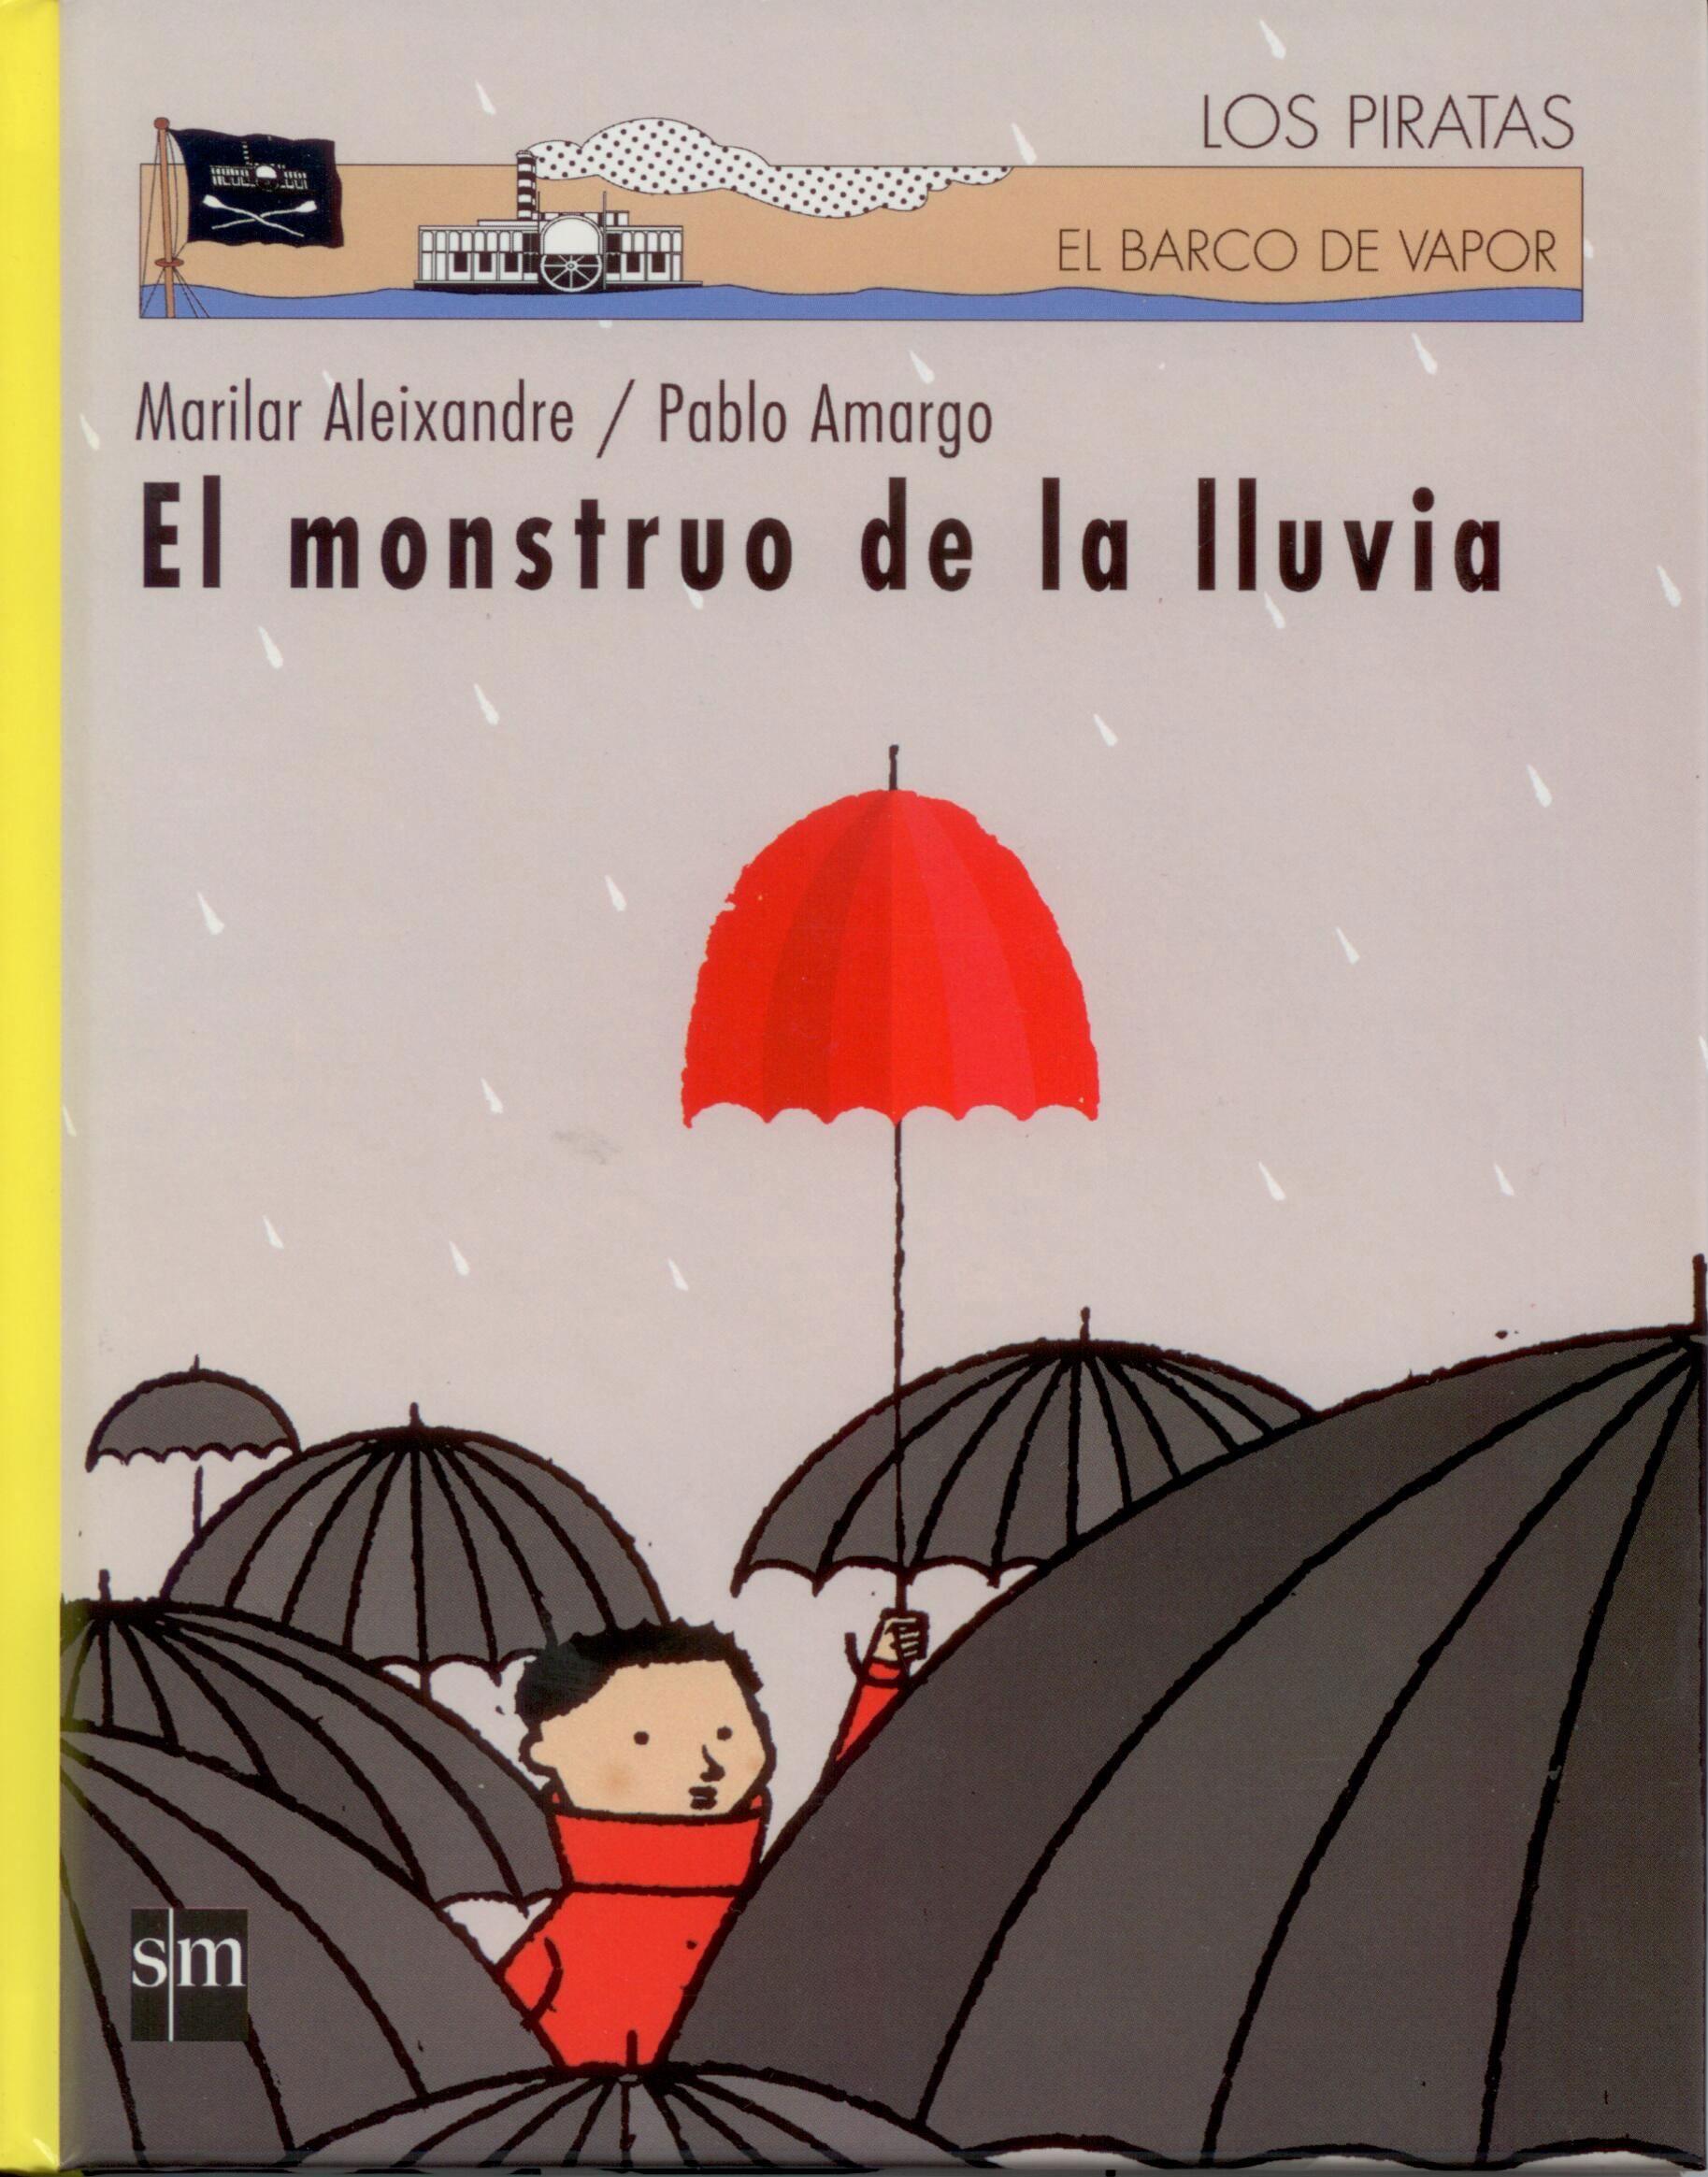 El monstruo de la lluvia